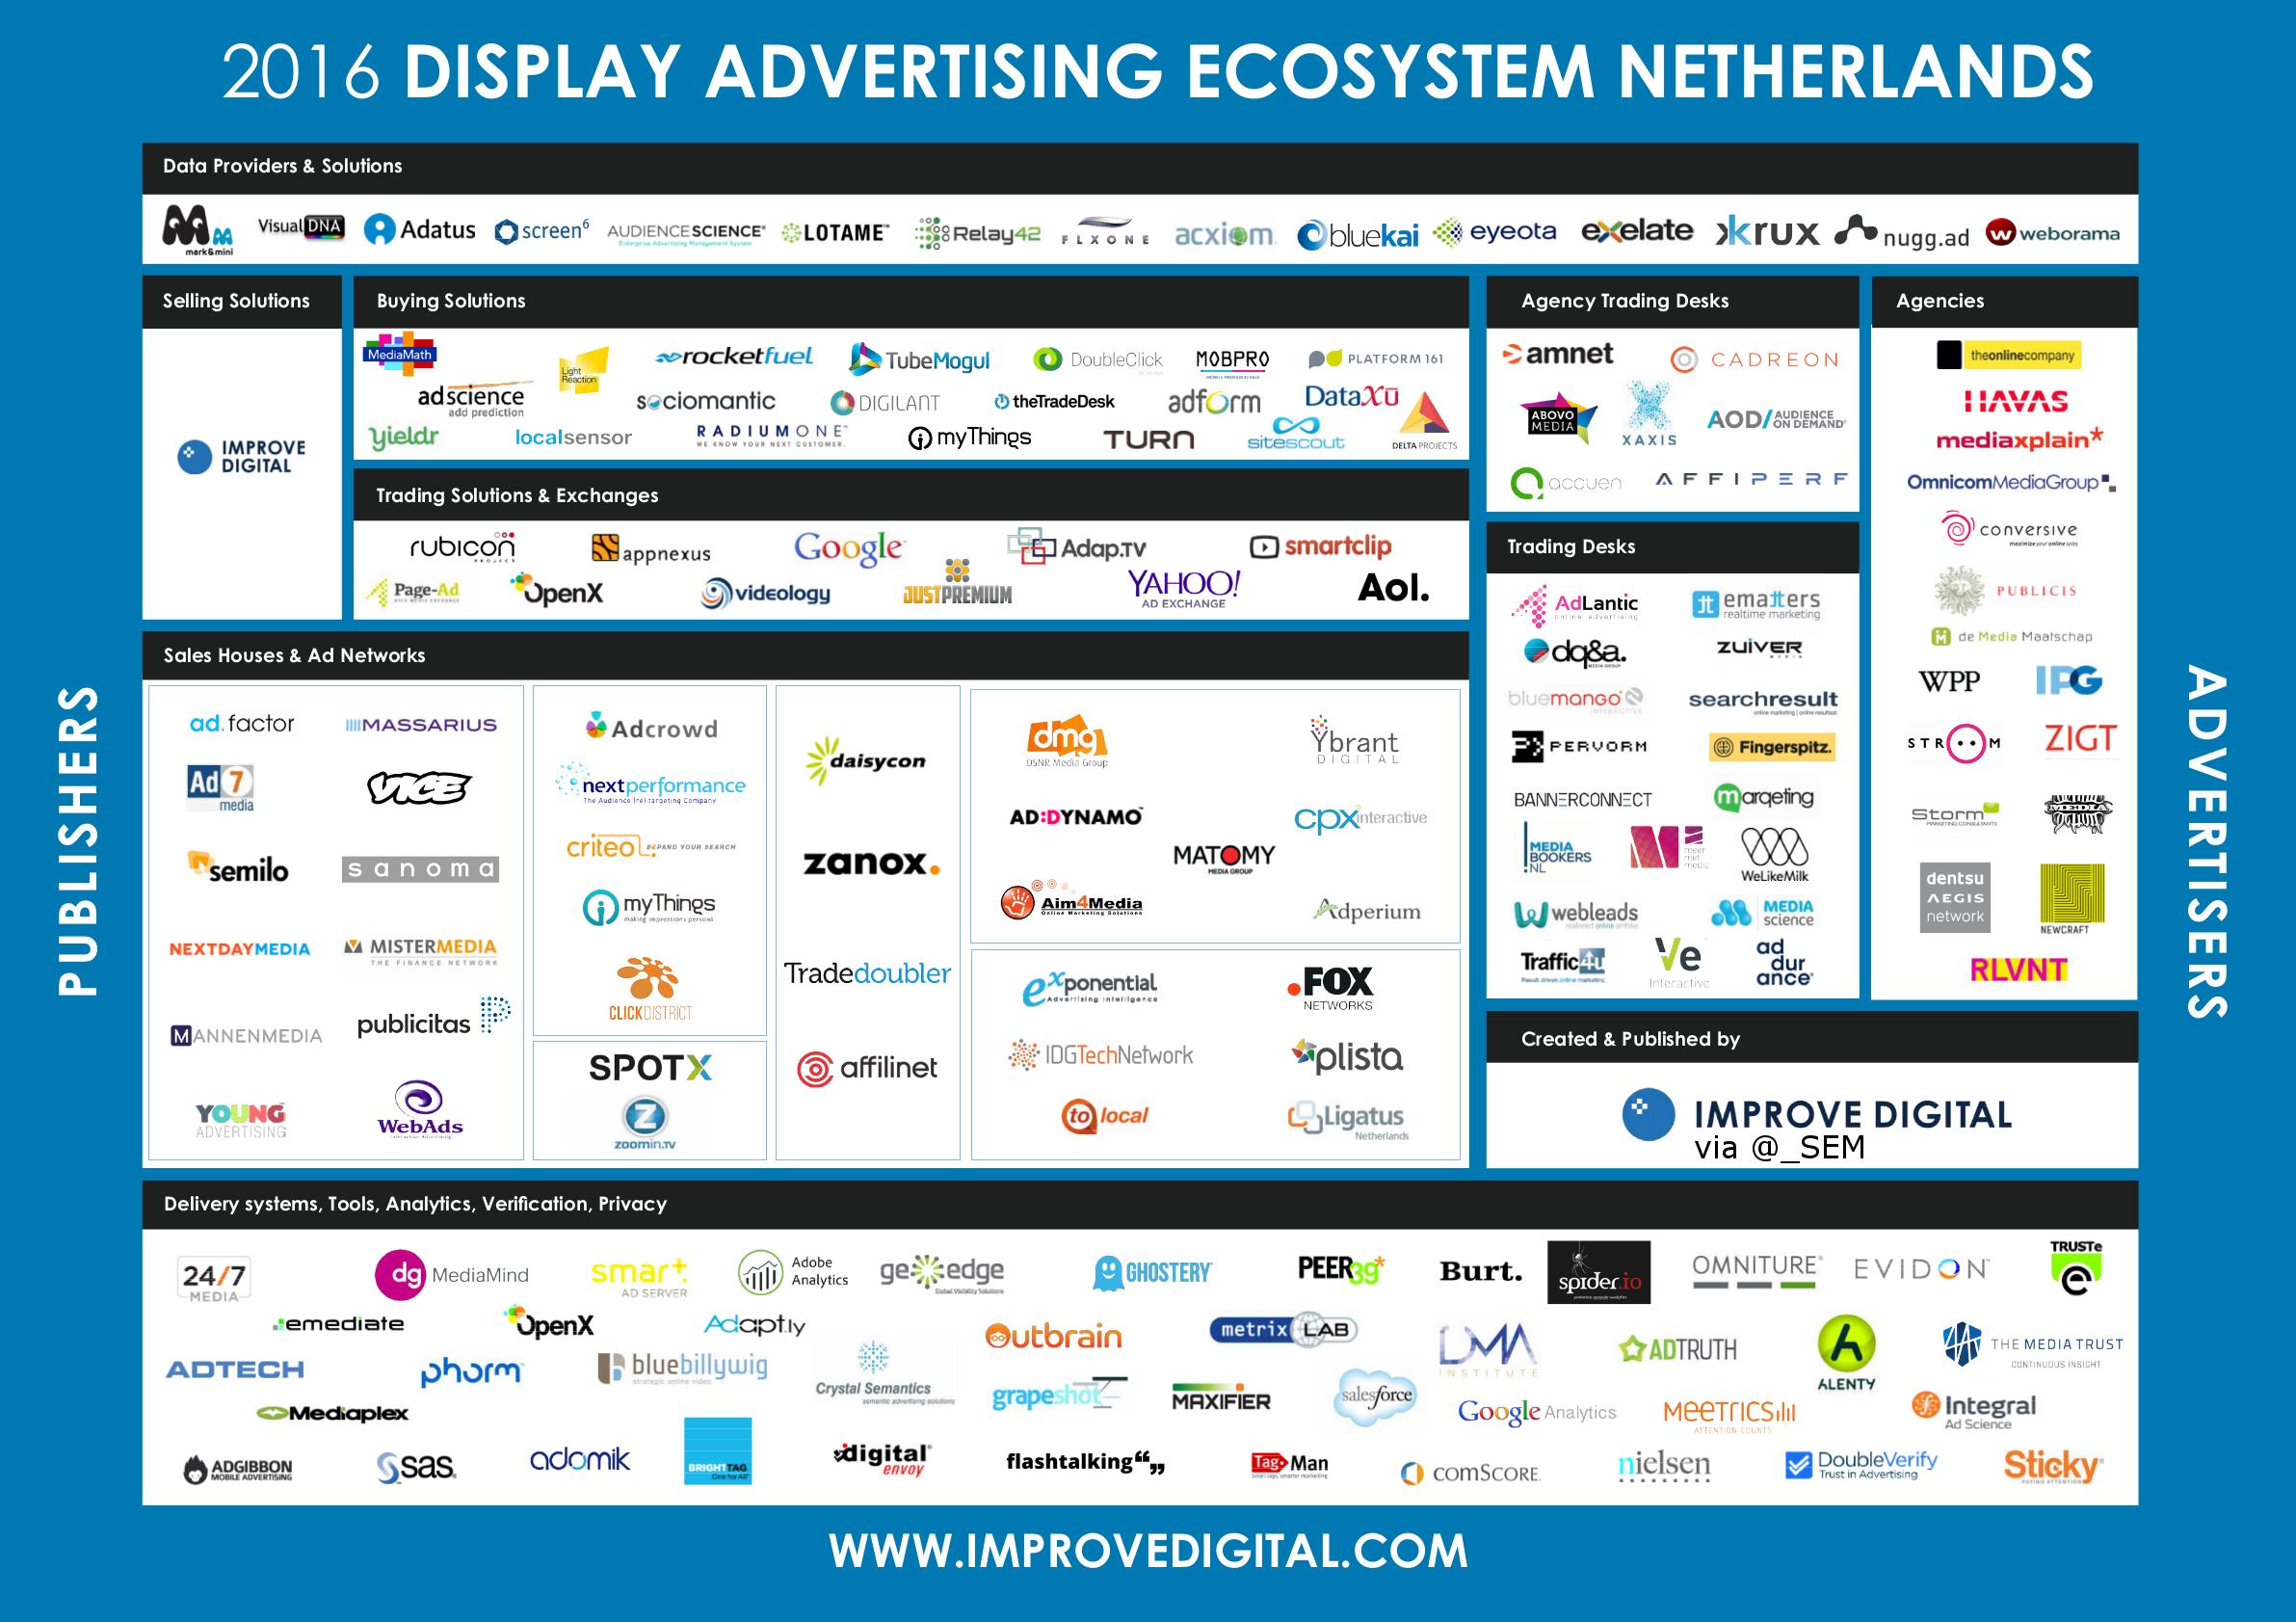 NL VIDEO DISPLAY ADVERTISING ECOSYSTEM Market Map - Digital advertising map luma 2016 us